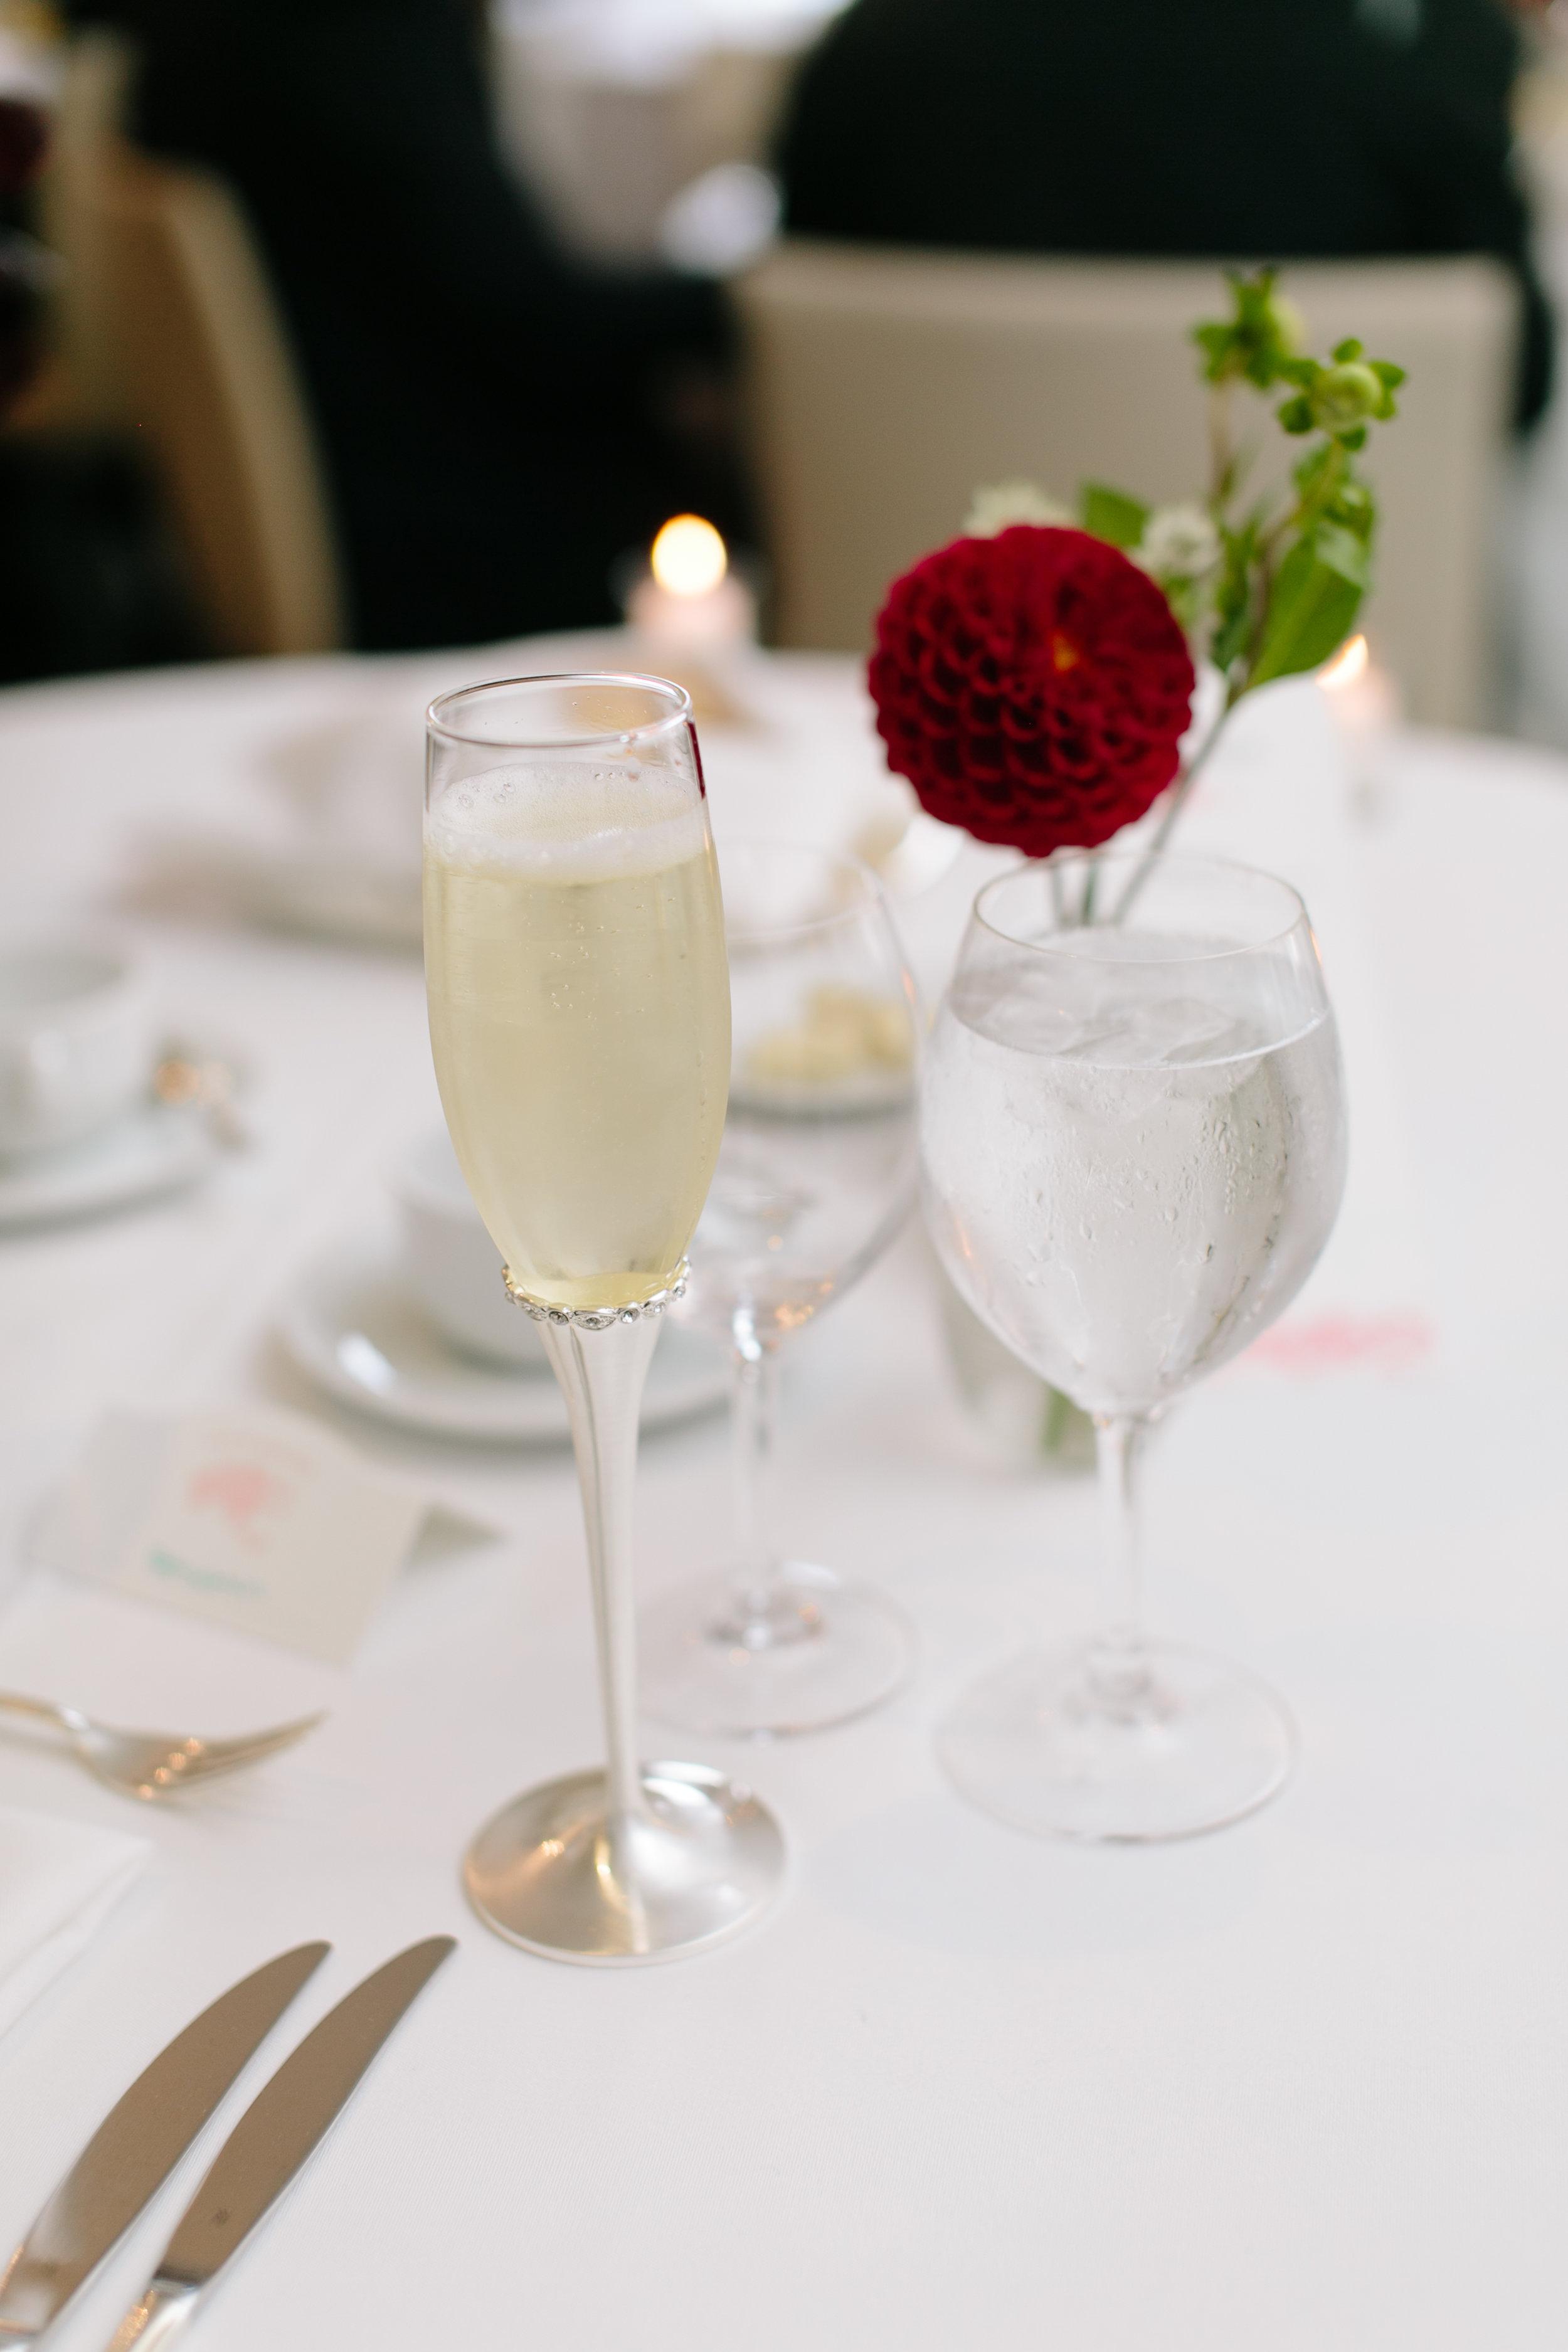 Phoebe Lo Events Toronto Wedding - Estates of Sunnybrook Rustic Event 026.jpg